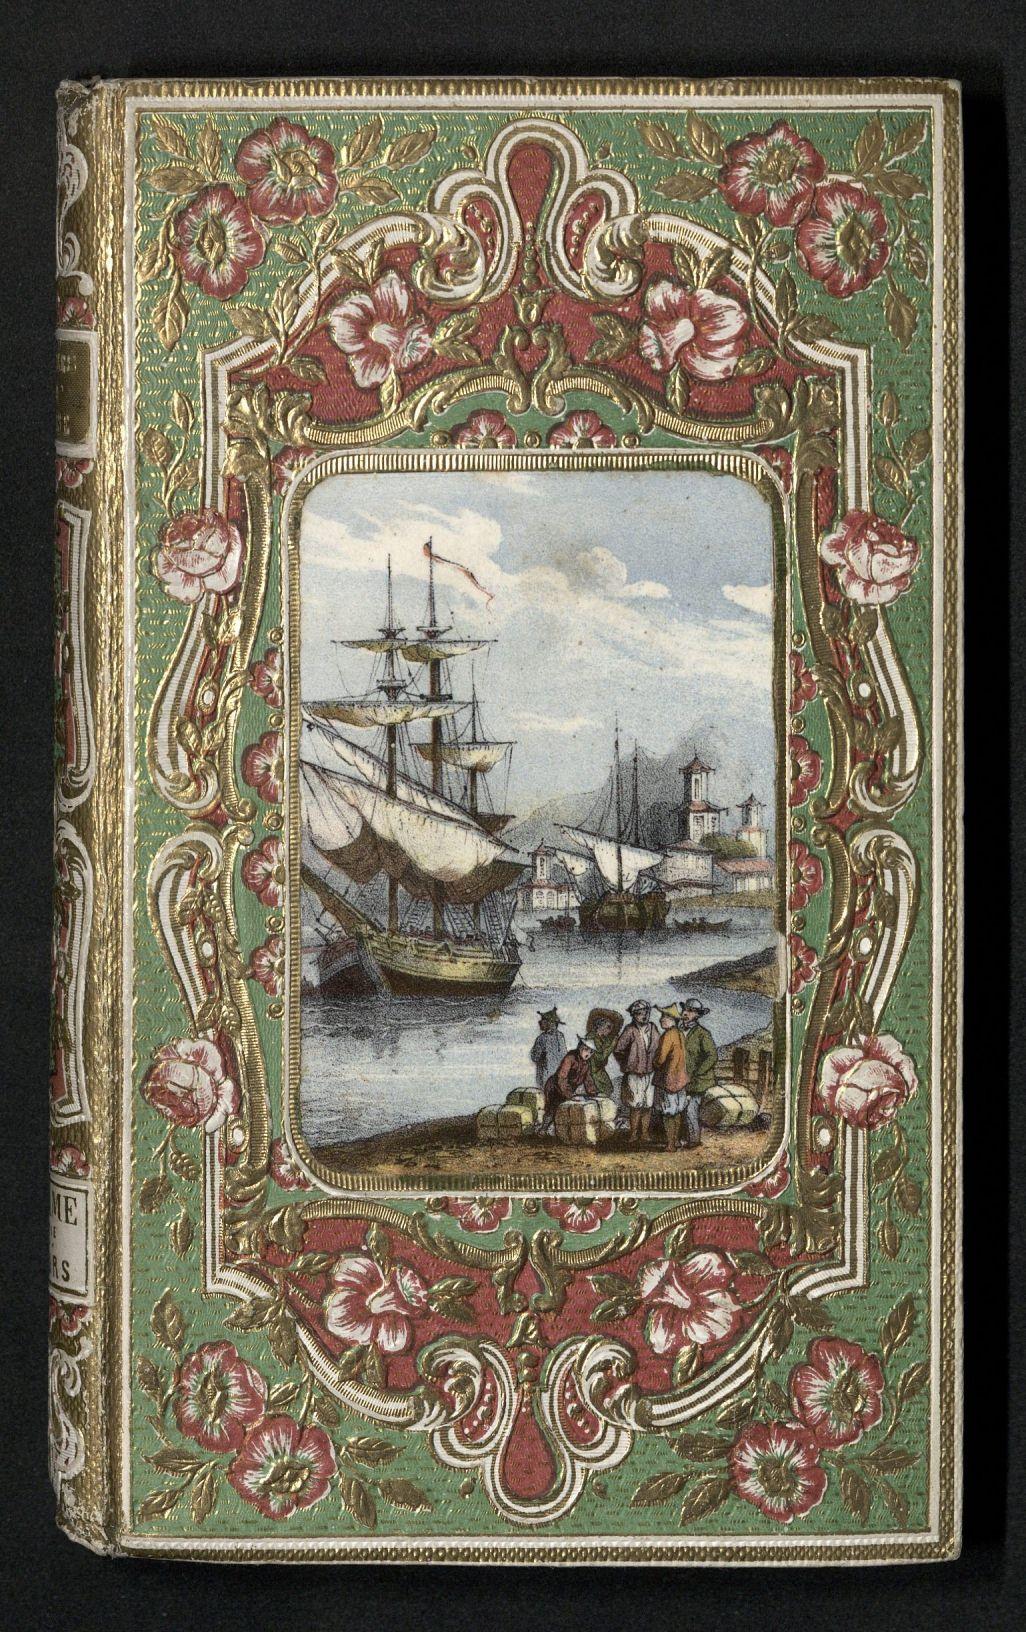 Garnier, Henri. Voyages en Perse, Arménie, Mésopotamie, Chaldée, Kurdistan, Arabie, etc., 1854.Typ 815.54.4166